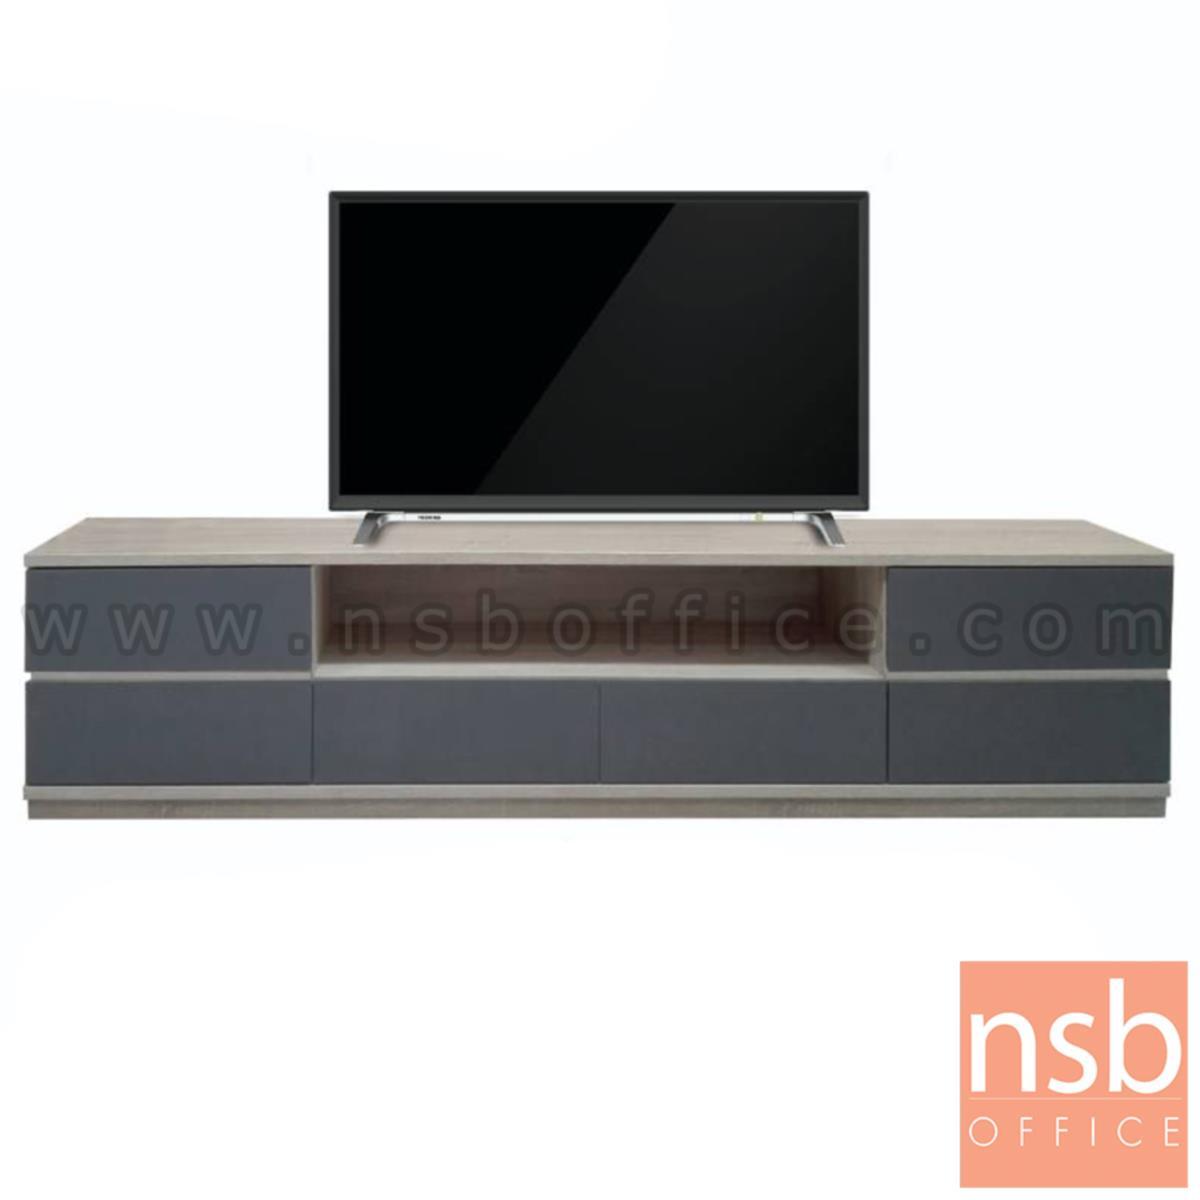 C08A062:ตู้วางทีวีไม้ รุ่น Garena (การีน่า)  ไม้ปาร์ติเกิลบอร์ด